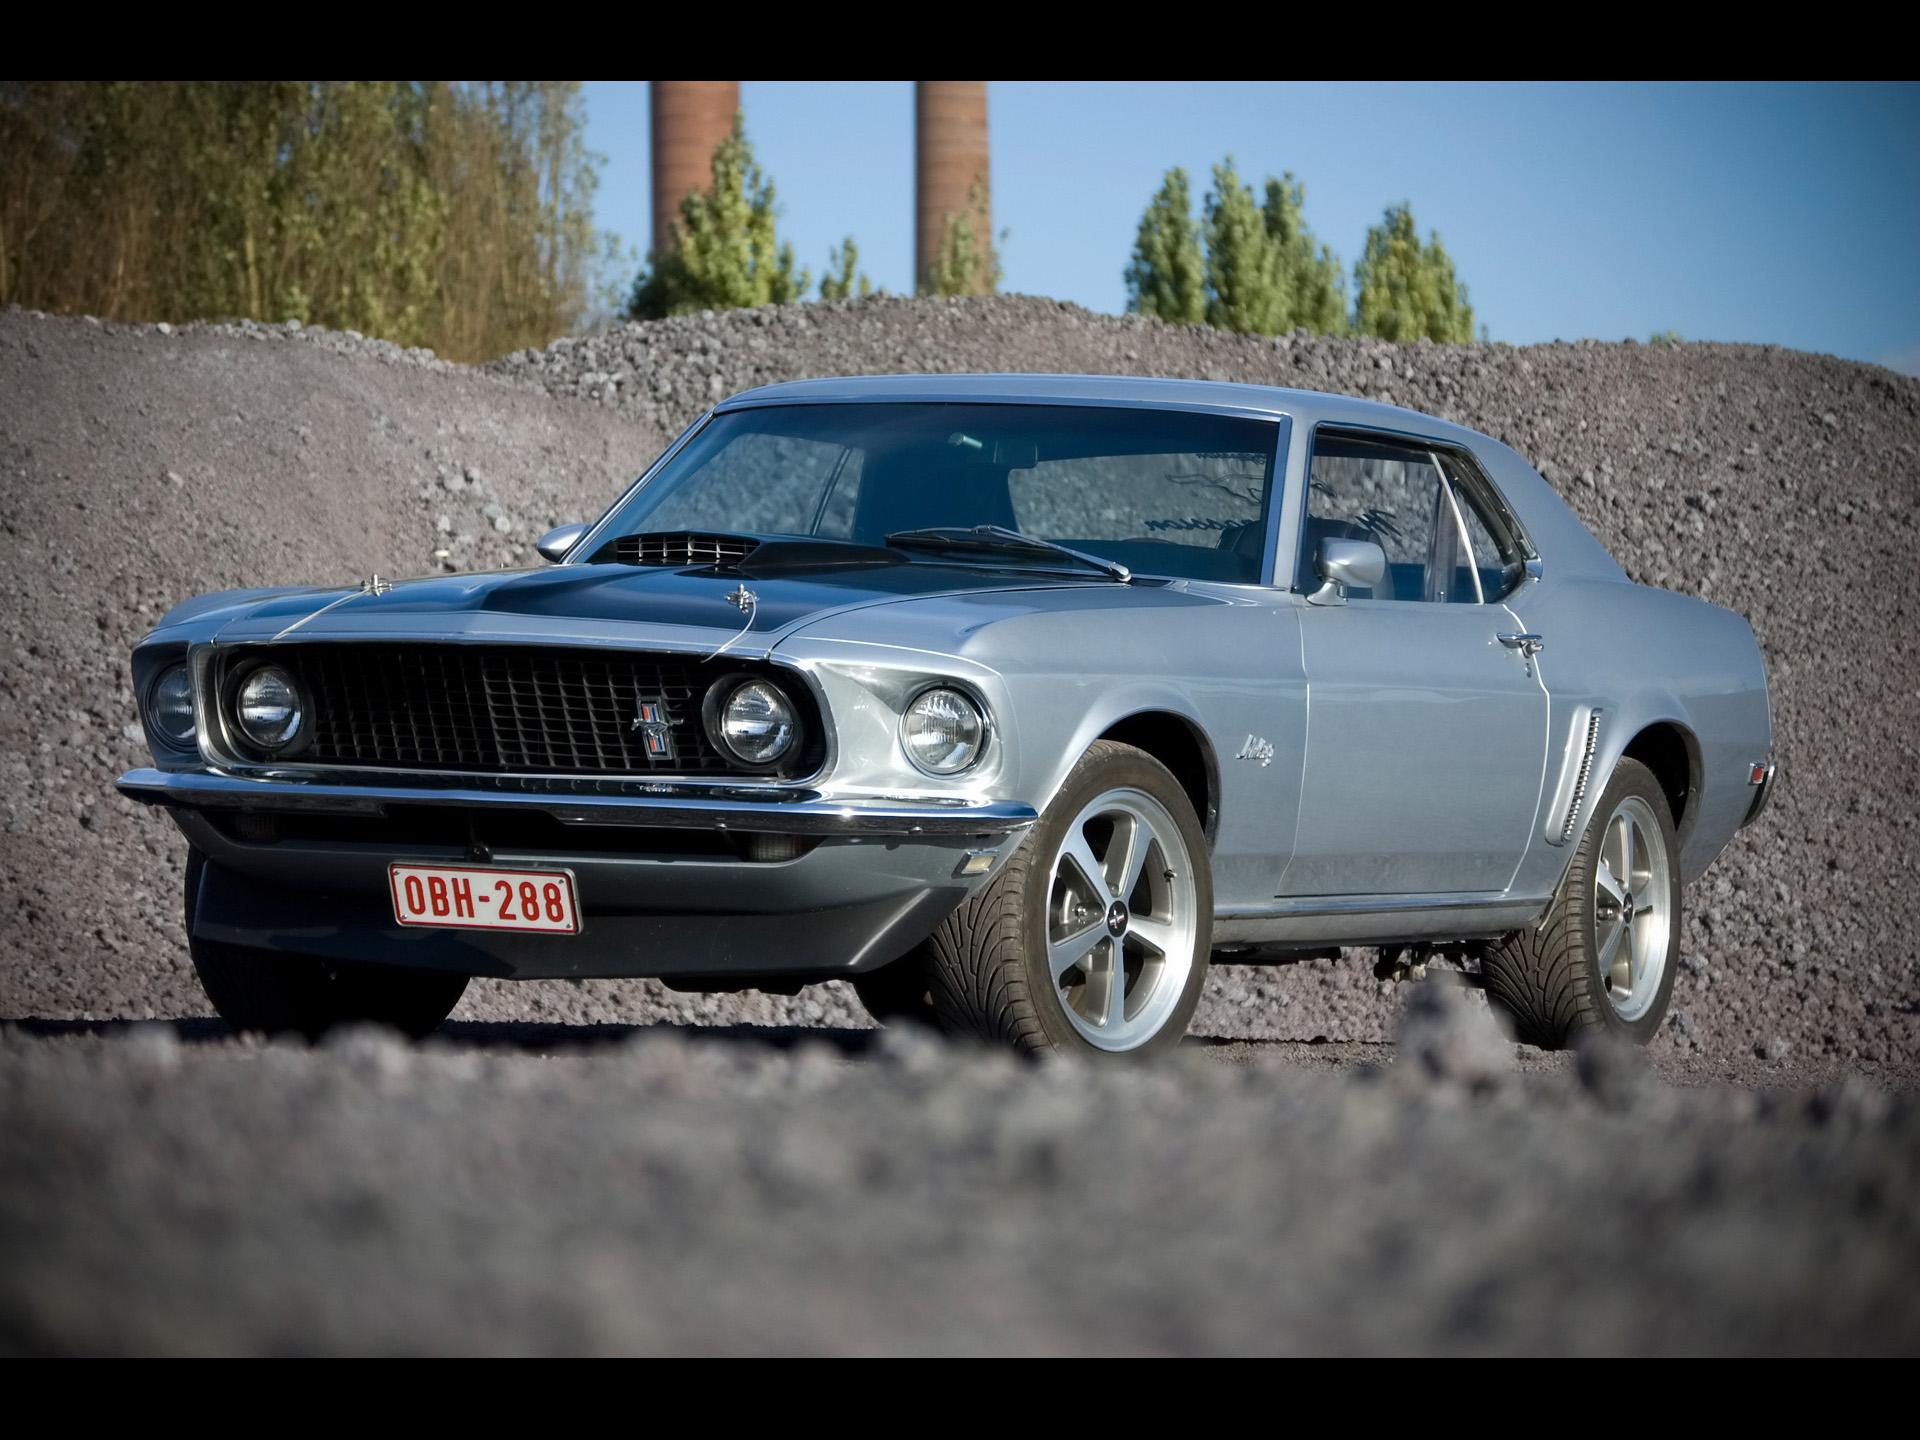 1969 ford mustang hardtop front angle 2 1920x1440 jpg